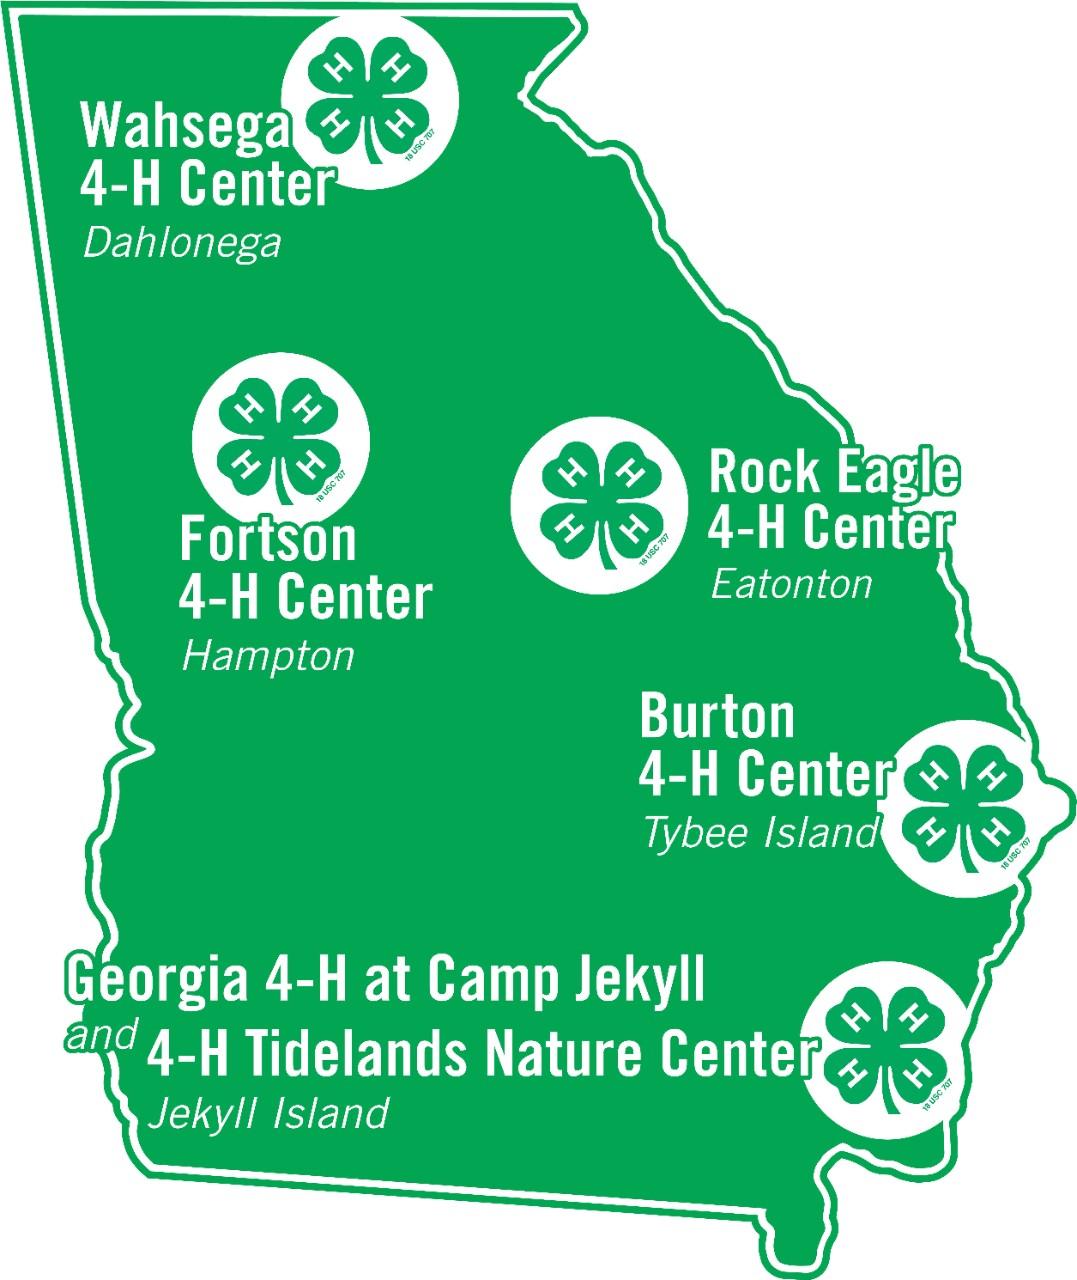 4-H Environmental Educators   UGA Cooperative Extension on jekyll island camping, jekyll island field trip, jekyll island history, jekyll island 4-h camp,